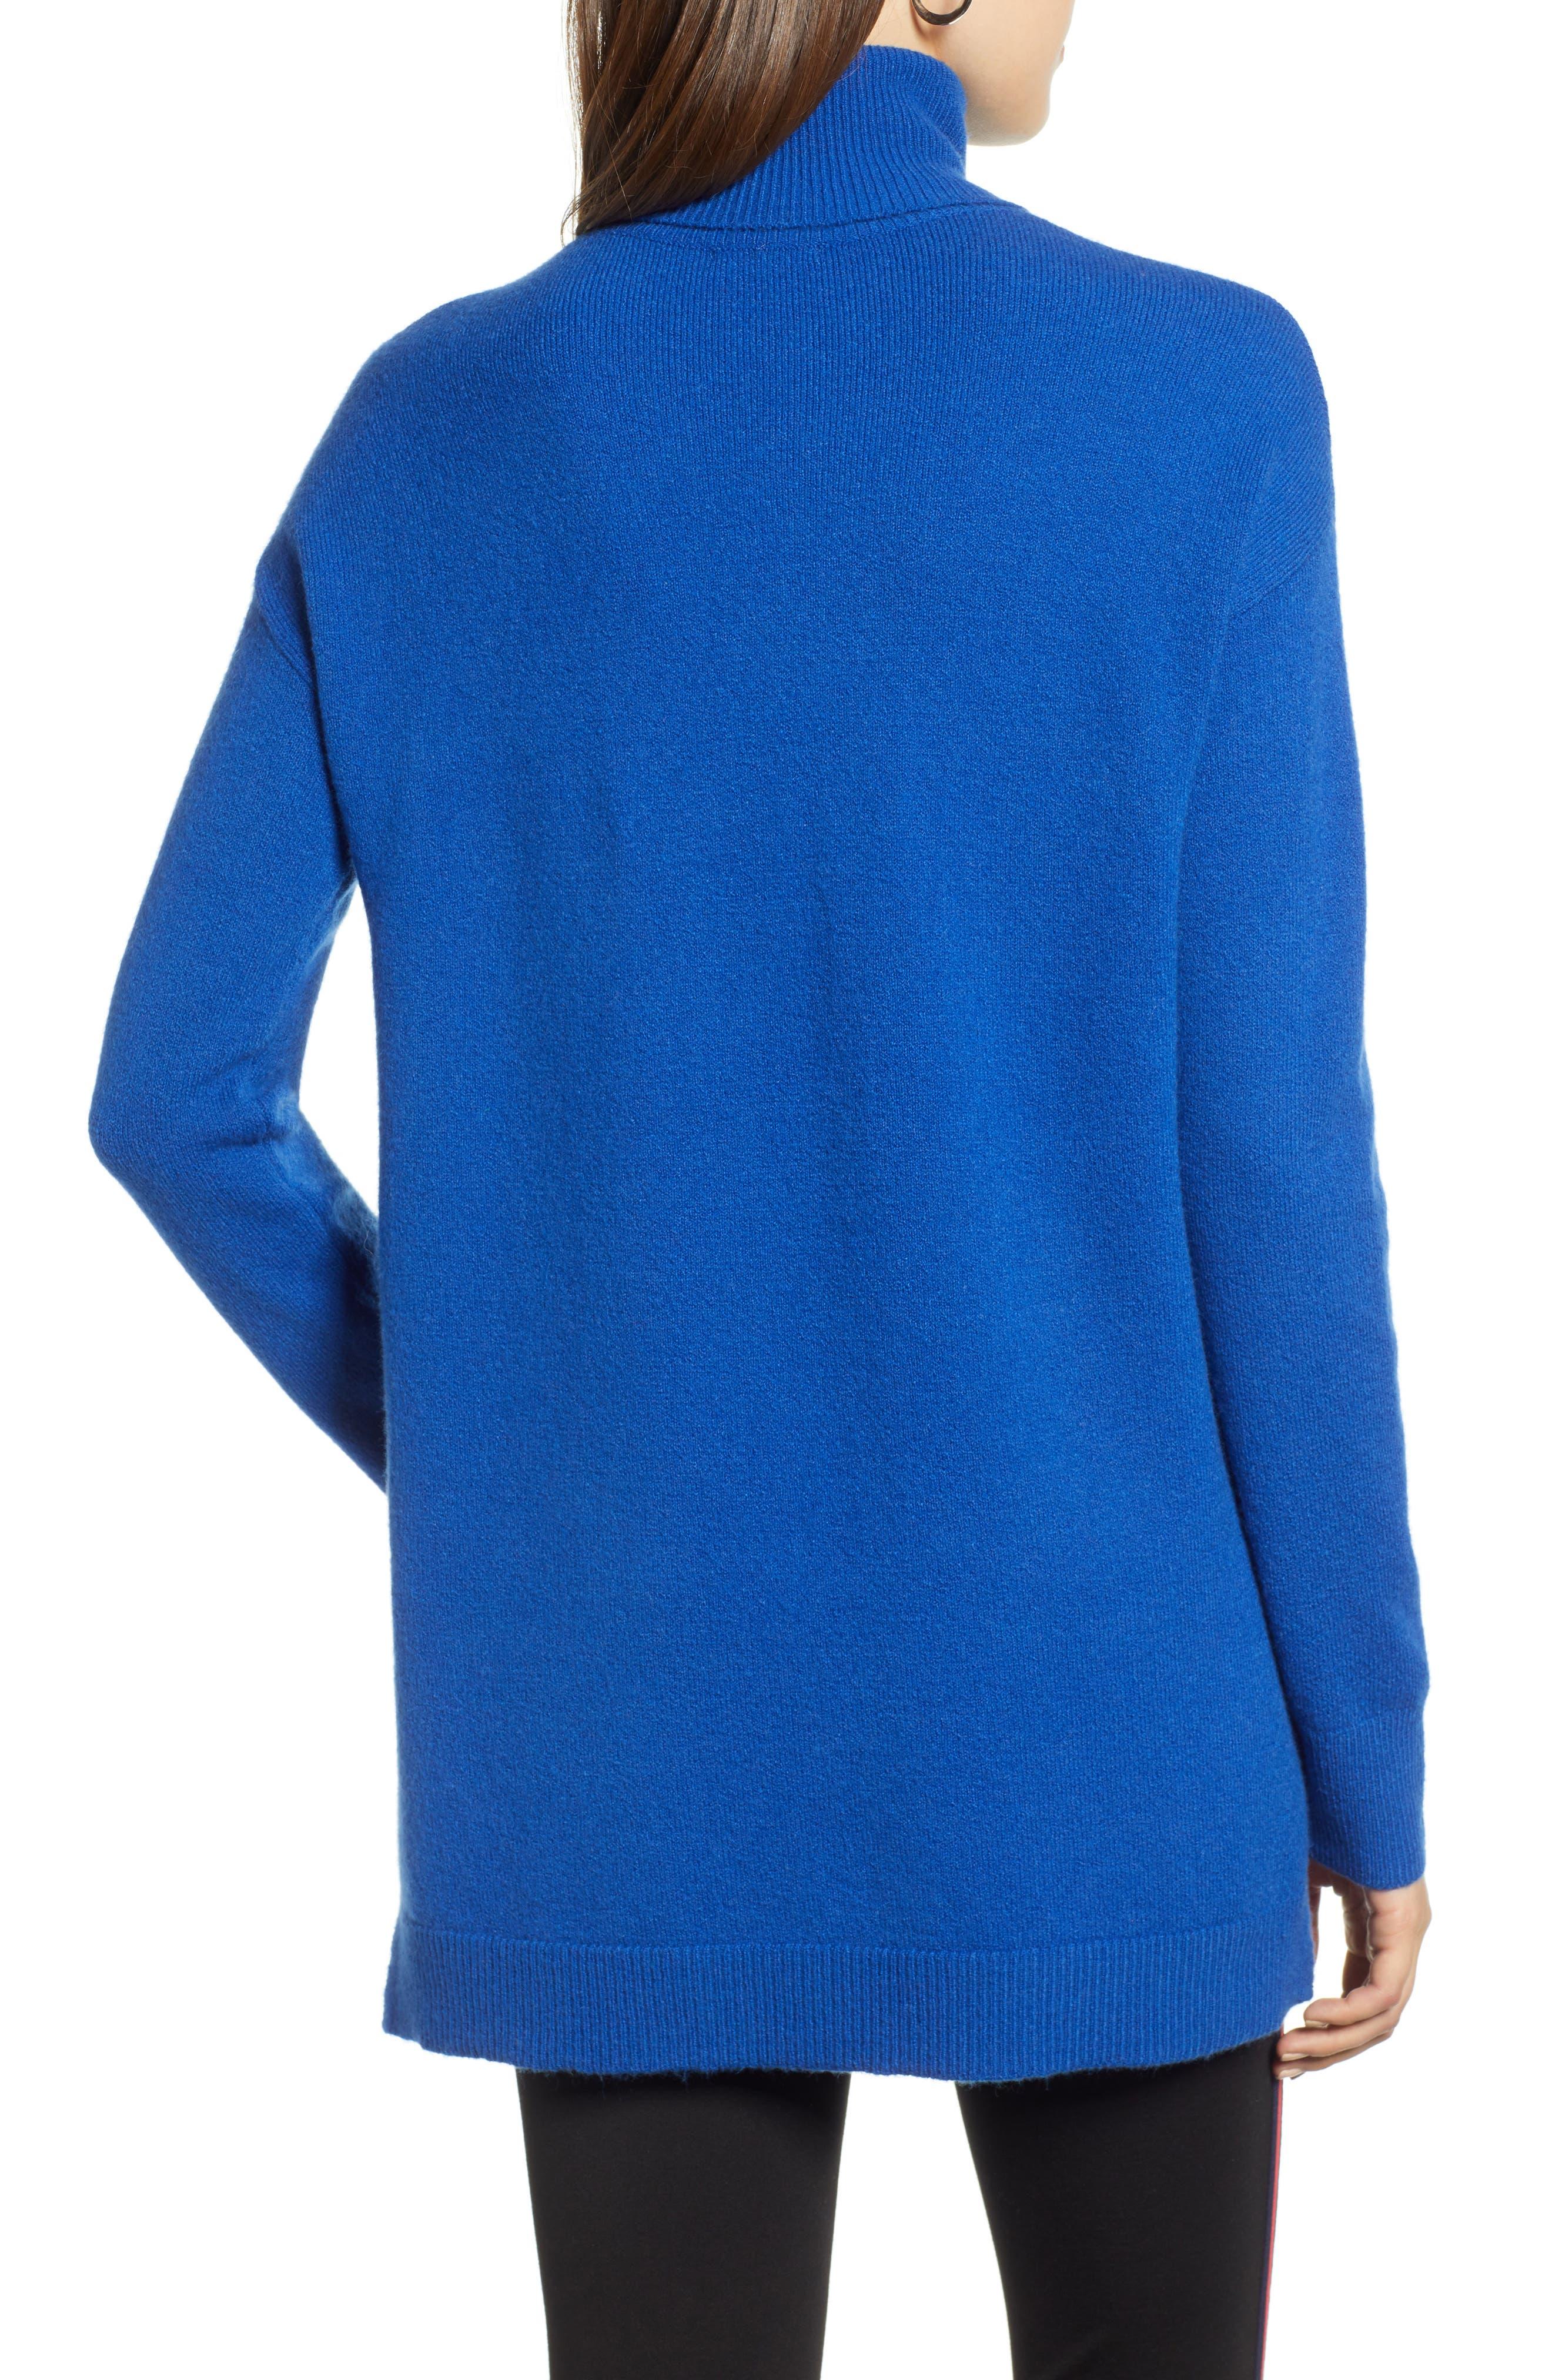 Turtleneck Wool Blend Tunic Sweater,                             Alternate thumbnail 2, color,                             BLUE MAZARINE